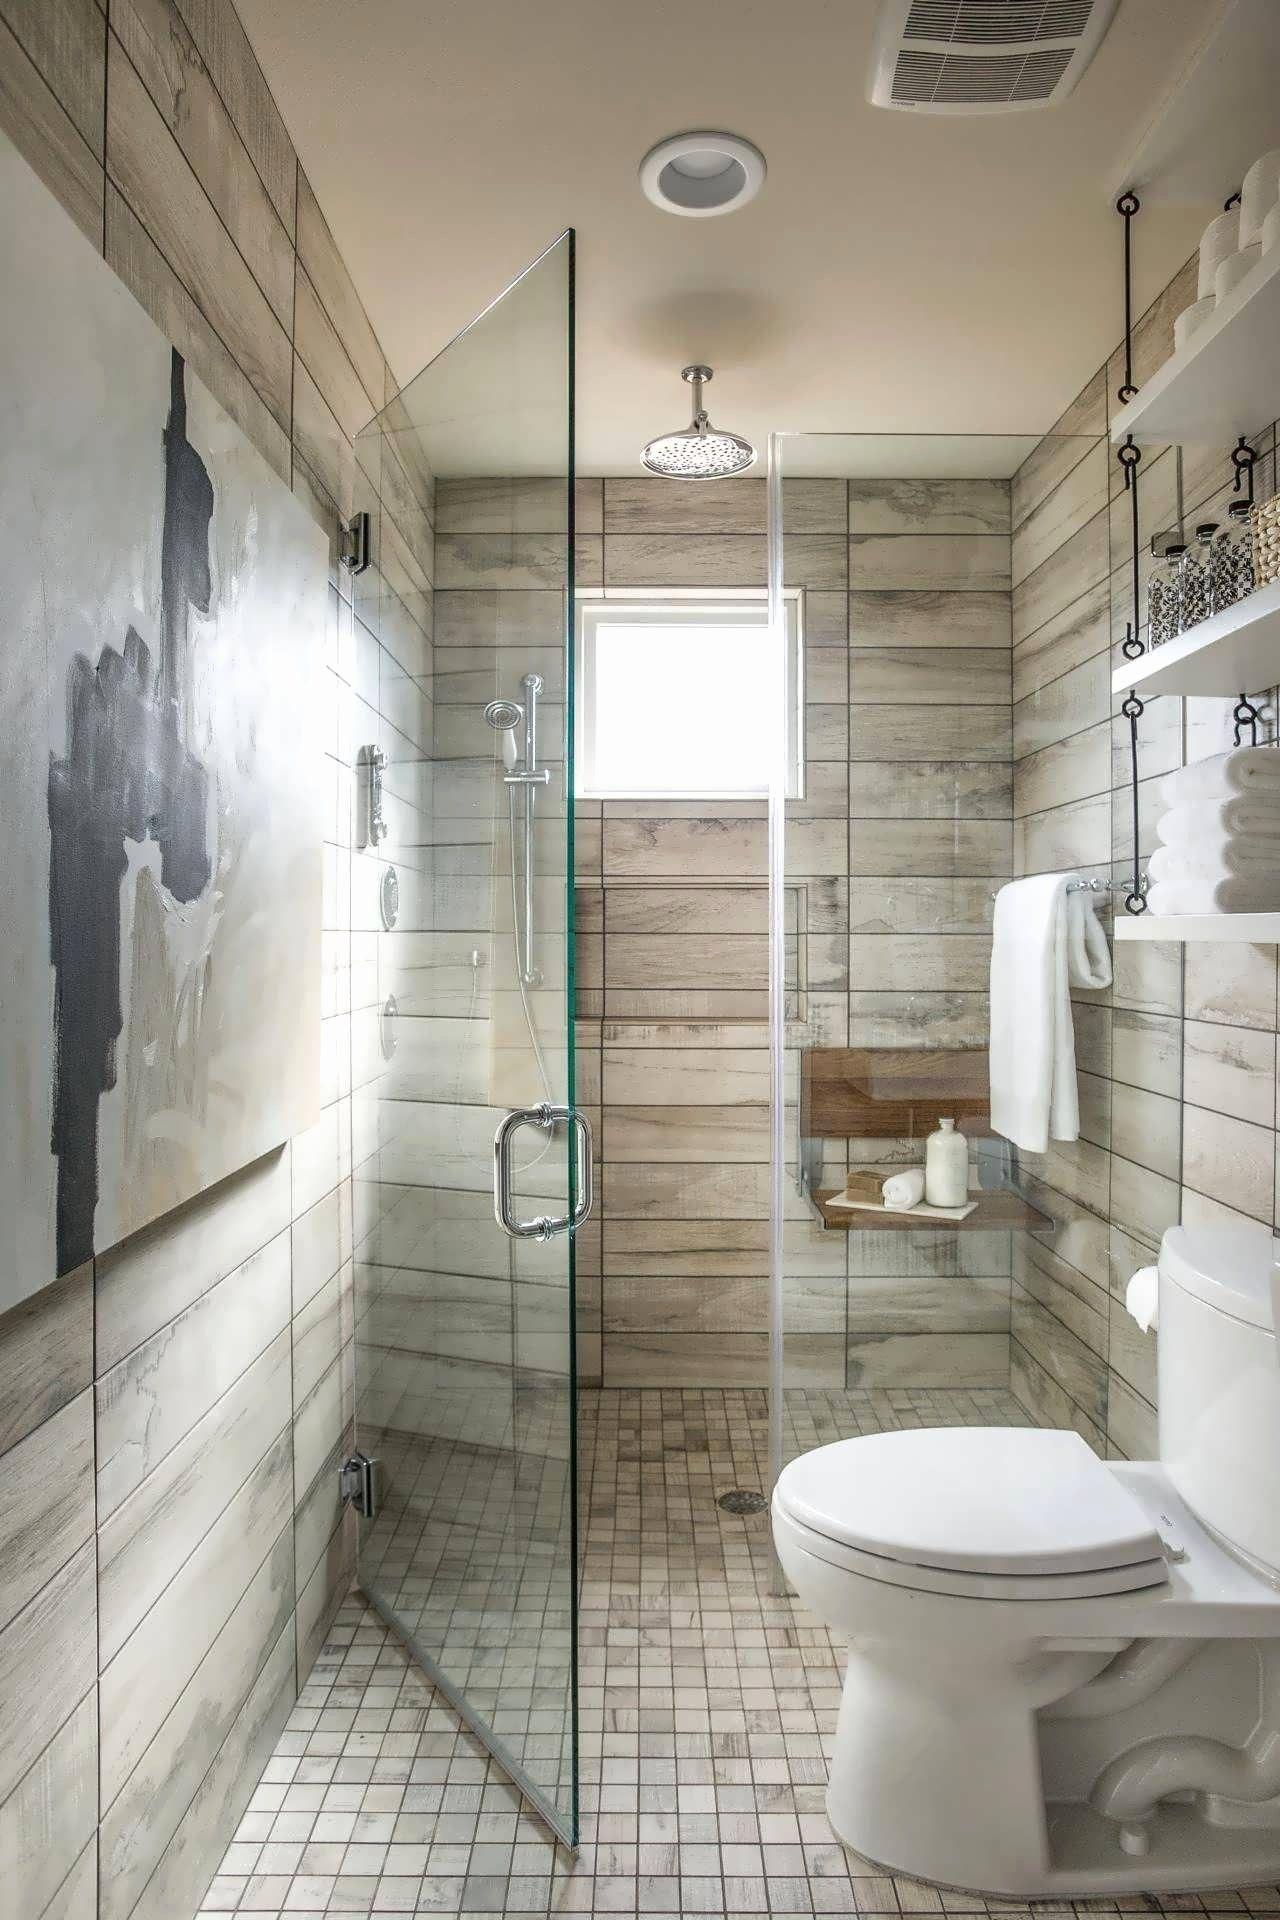 Ada Bathroom Remodel Ideas Inspirational 3 Nice Small Bathroom